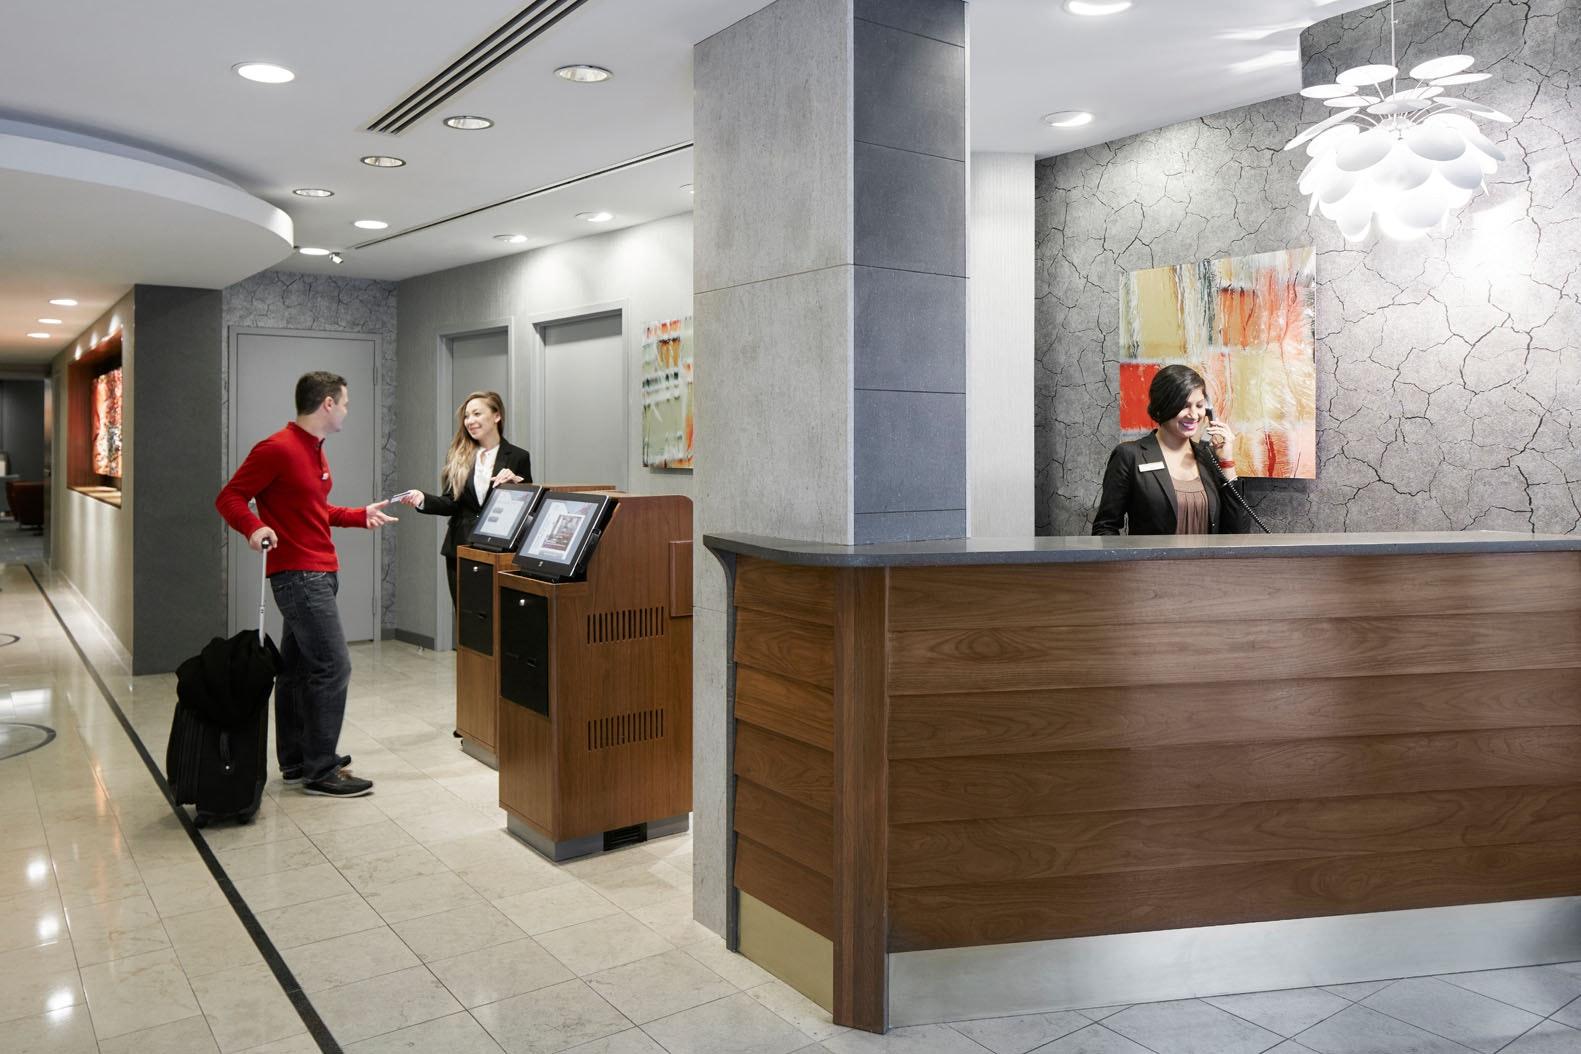 Member Service Desk at Club Quarters Hotel